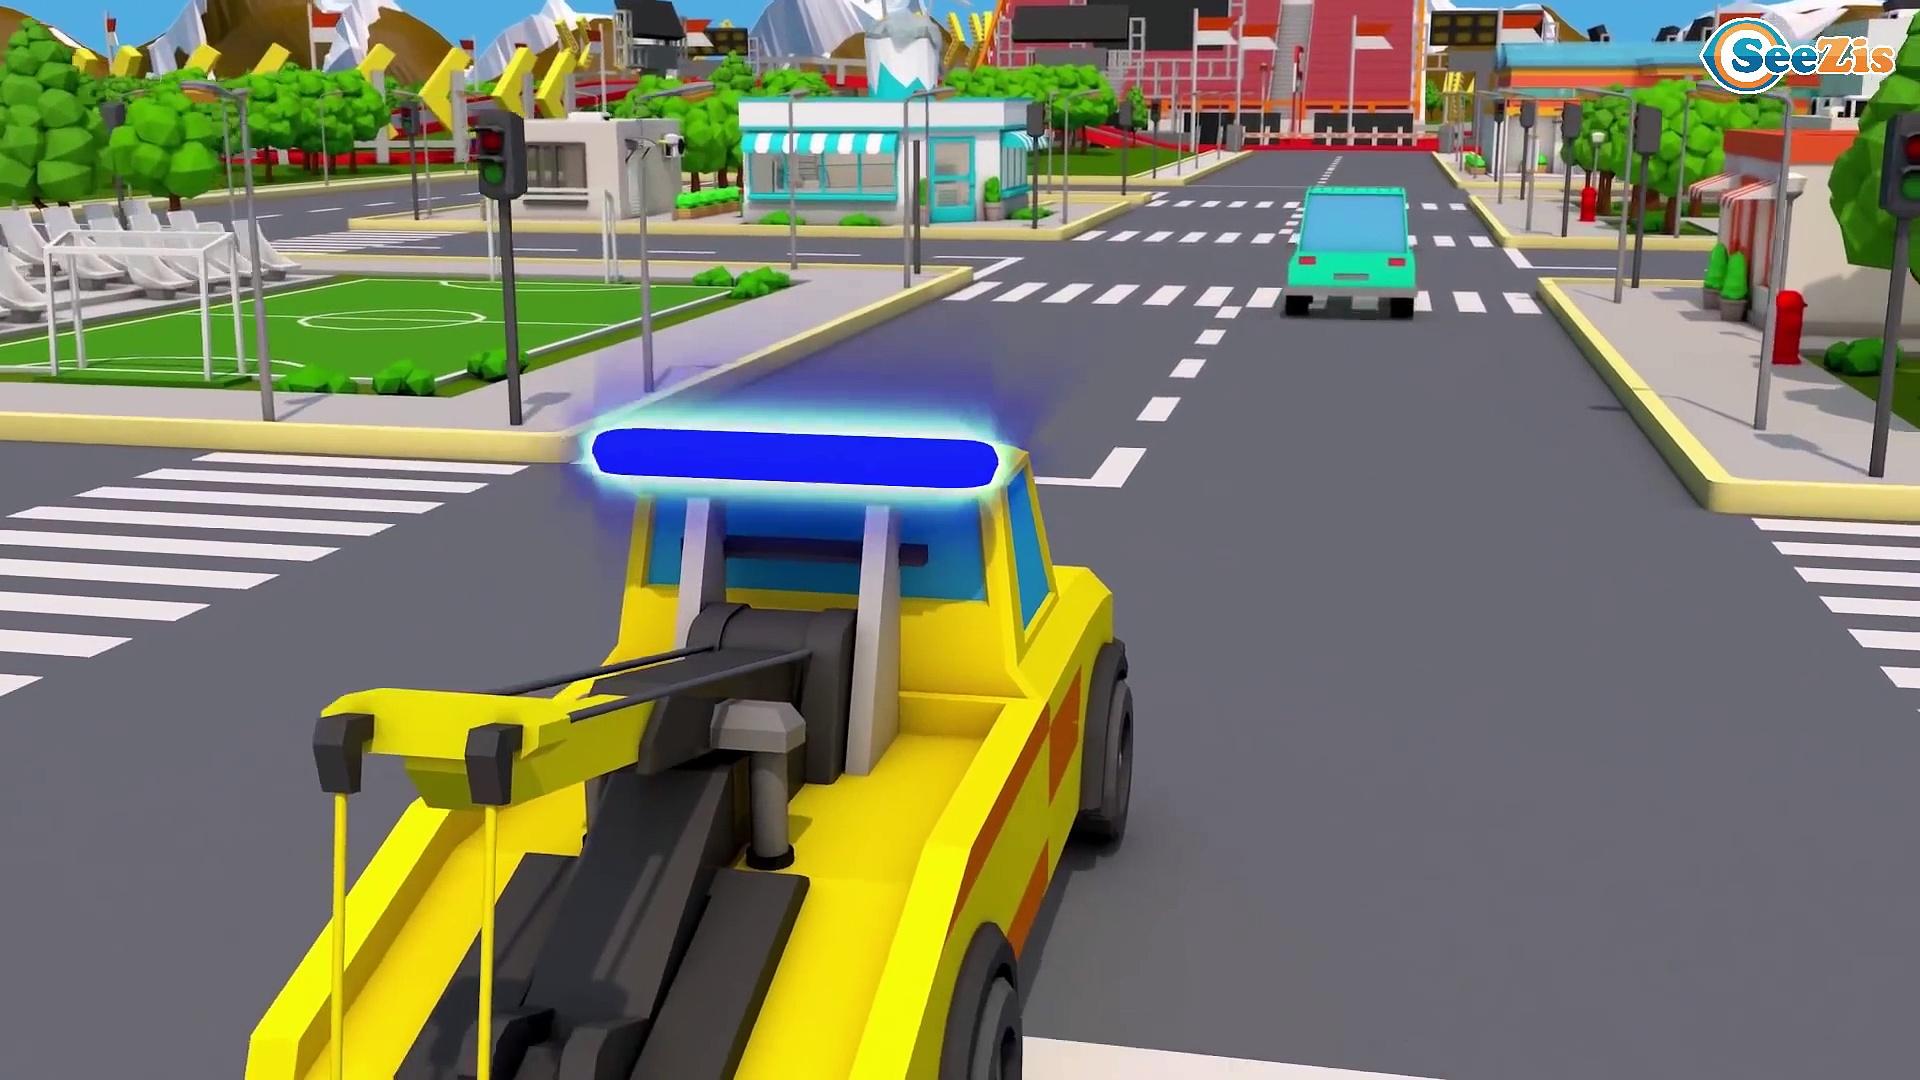 Super Red Truck CRASH on the Road in Trucks City | Trucks Cartoon for kids | Cars & Trucks Stories